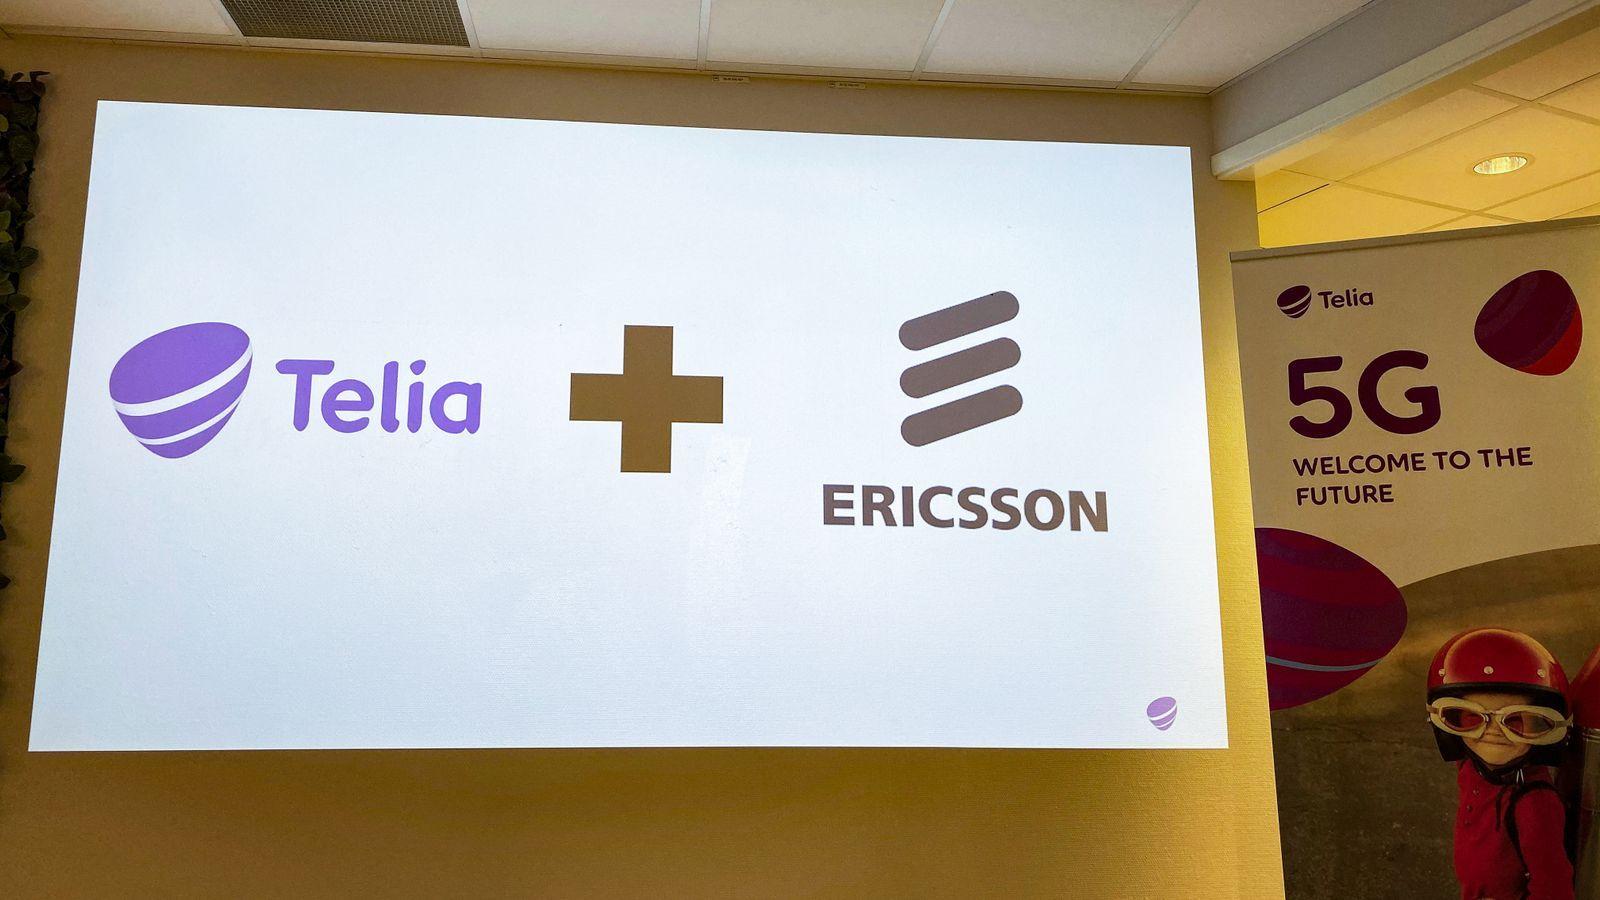 Nå skrur Telia på 5G i Trondheim